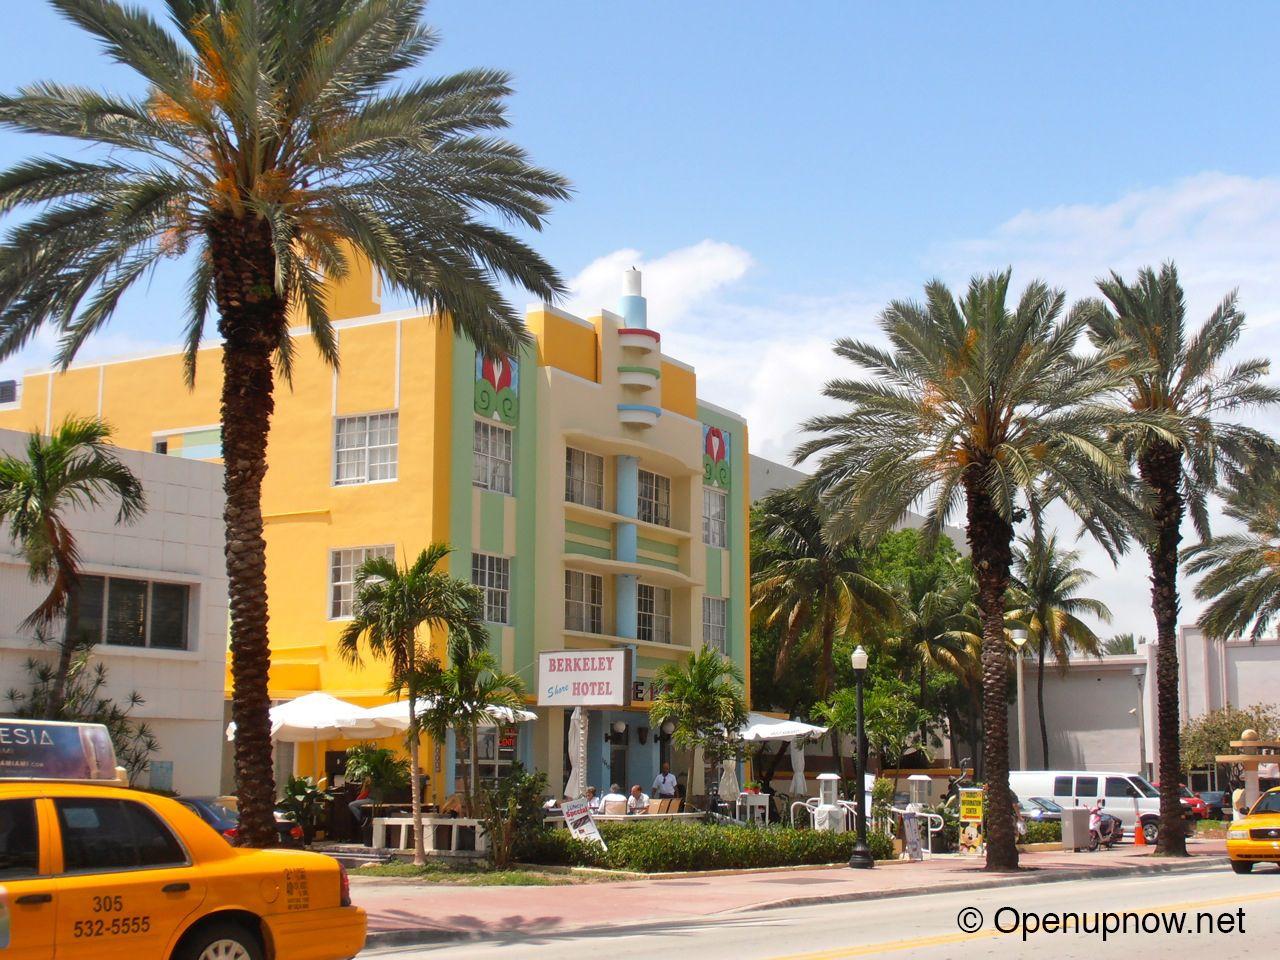 Berkeley Hotel in SoBe, Miami © Openupnow.net